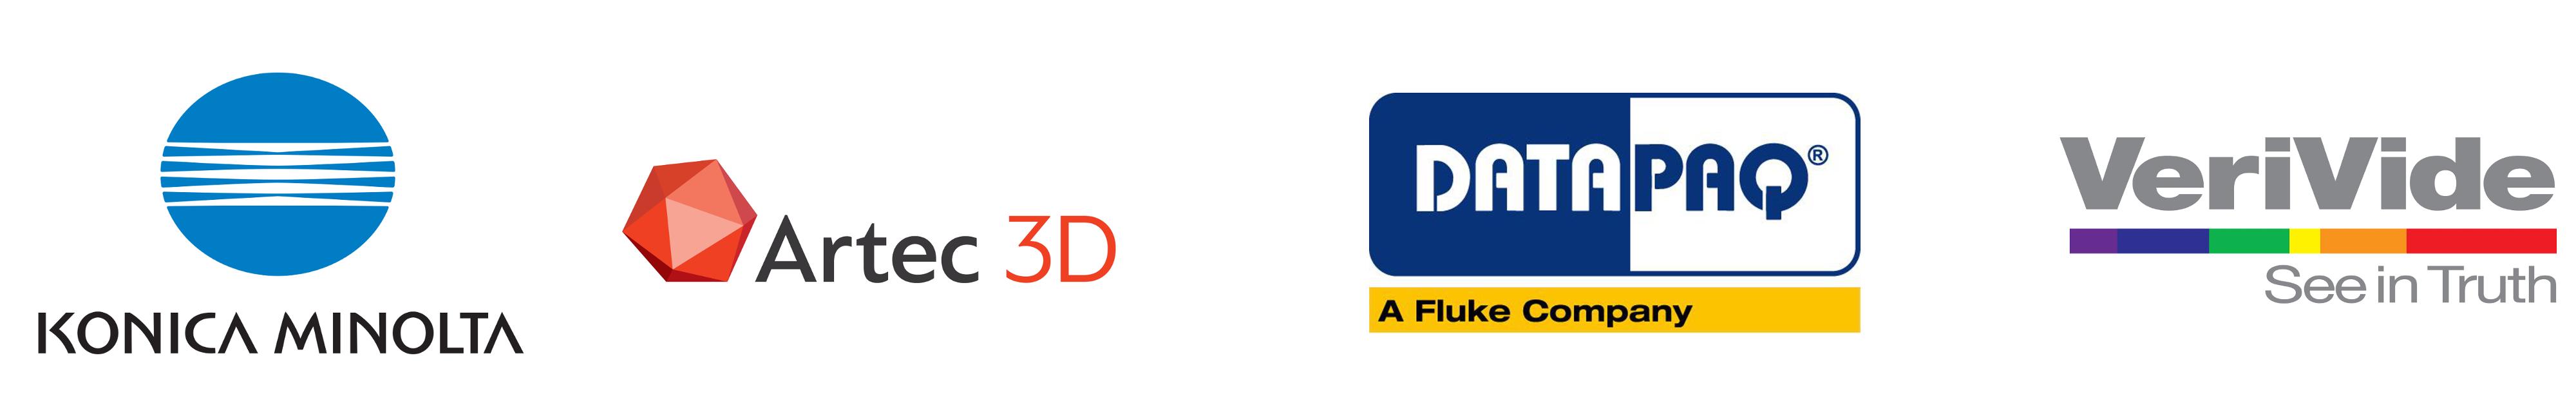 Logos peq KM+Artec+VeriVide+Datapaq